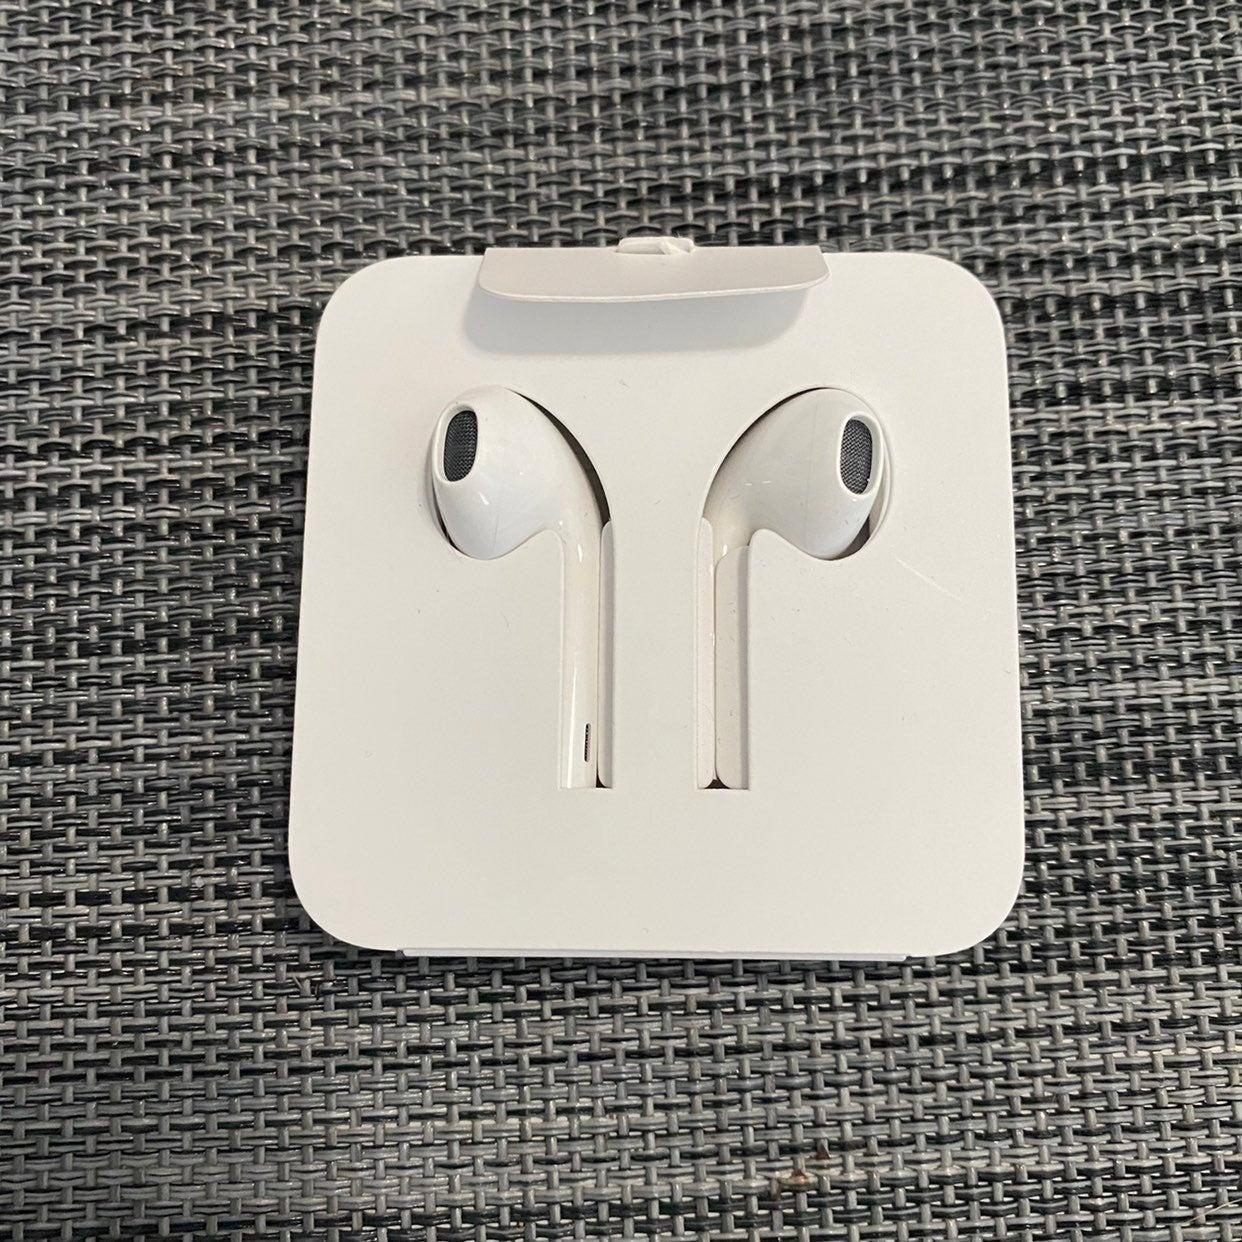 NEW Apple Wired to Lightening Headphones